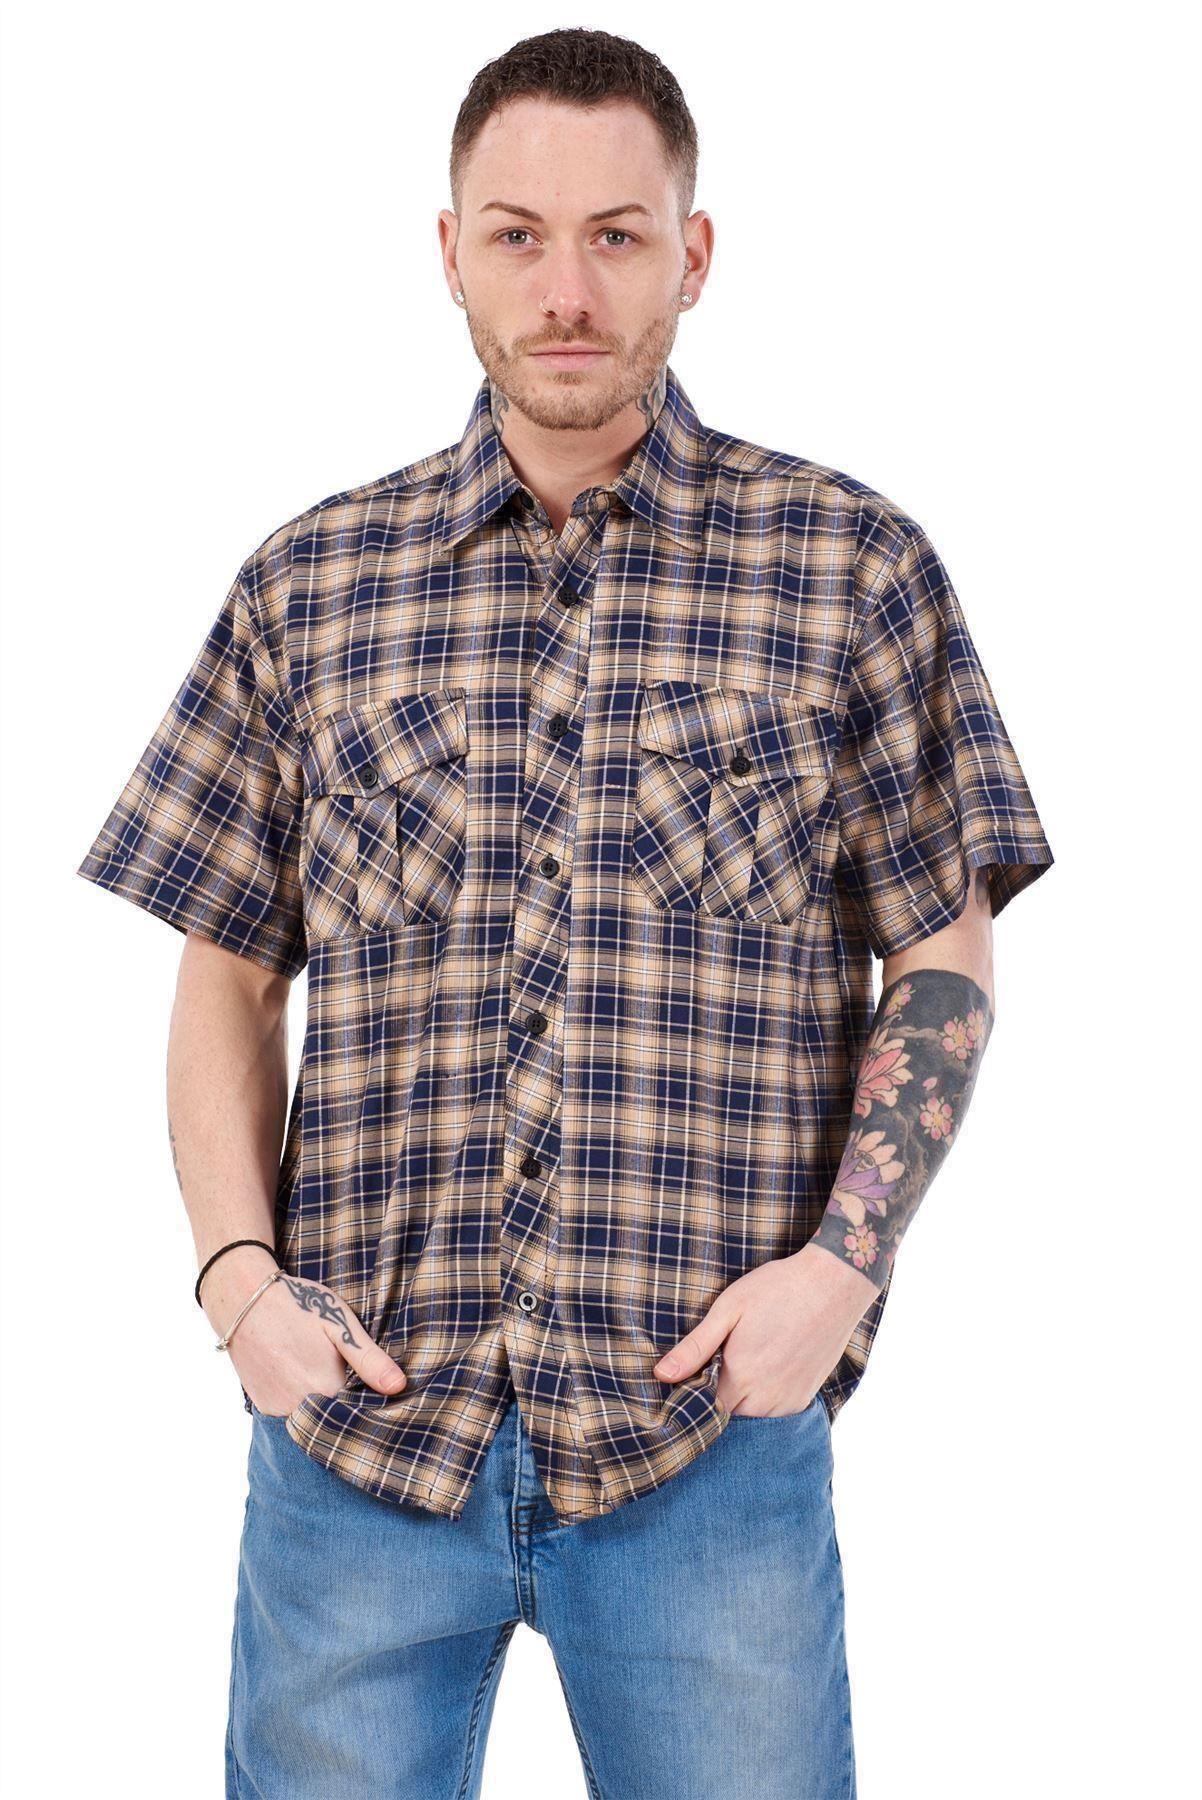 Mens-Regular-Big-Size-Shirts-Checked-Cotton-Blend-Casual-Short-Sleeve-Blue-M-5XL thumbnail 11